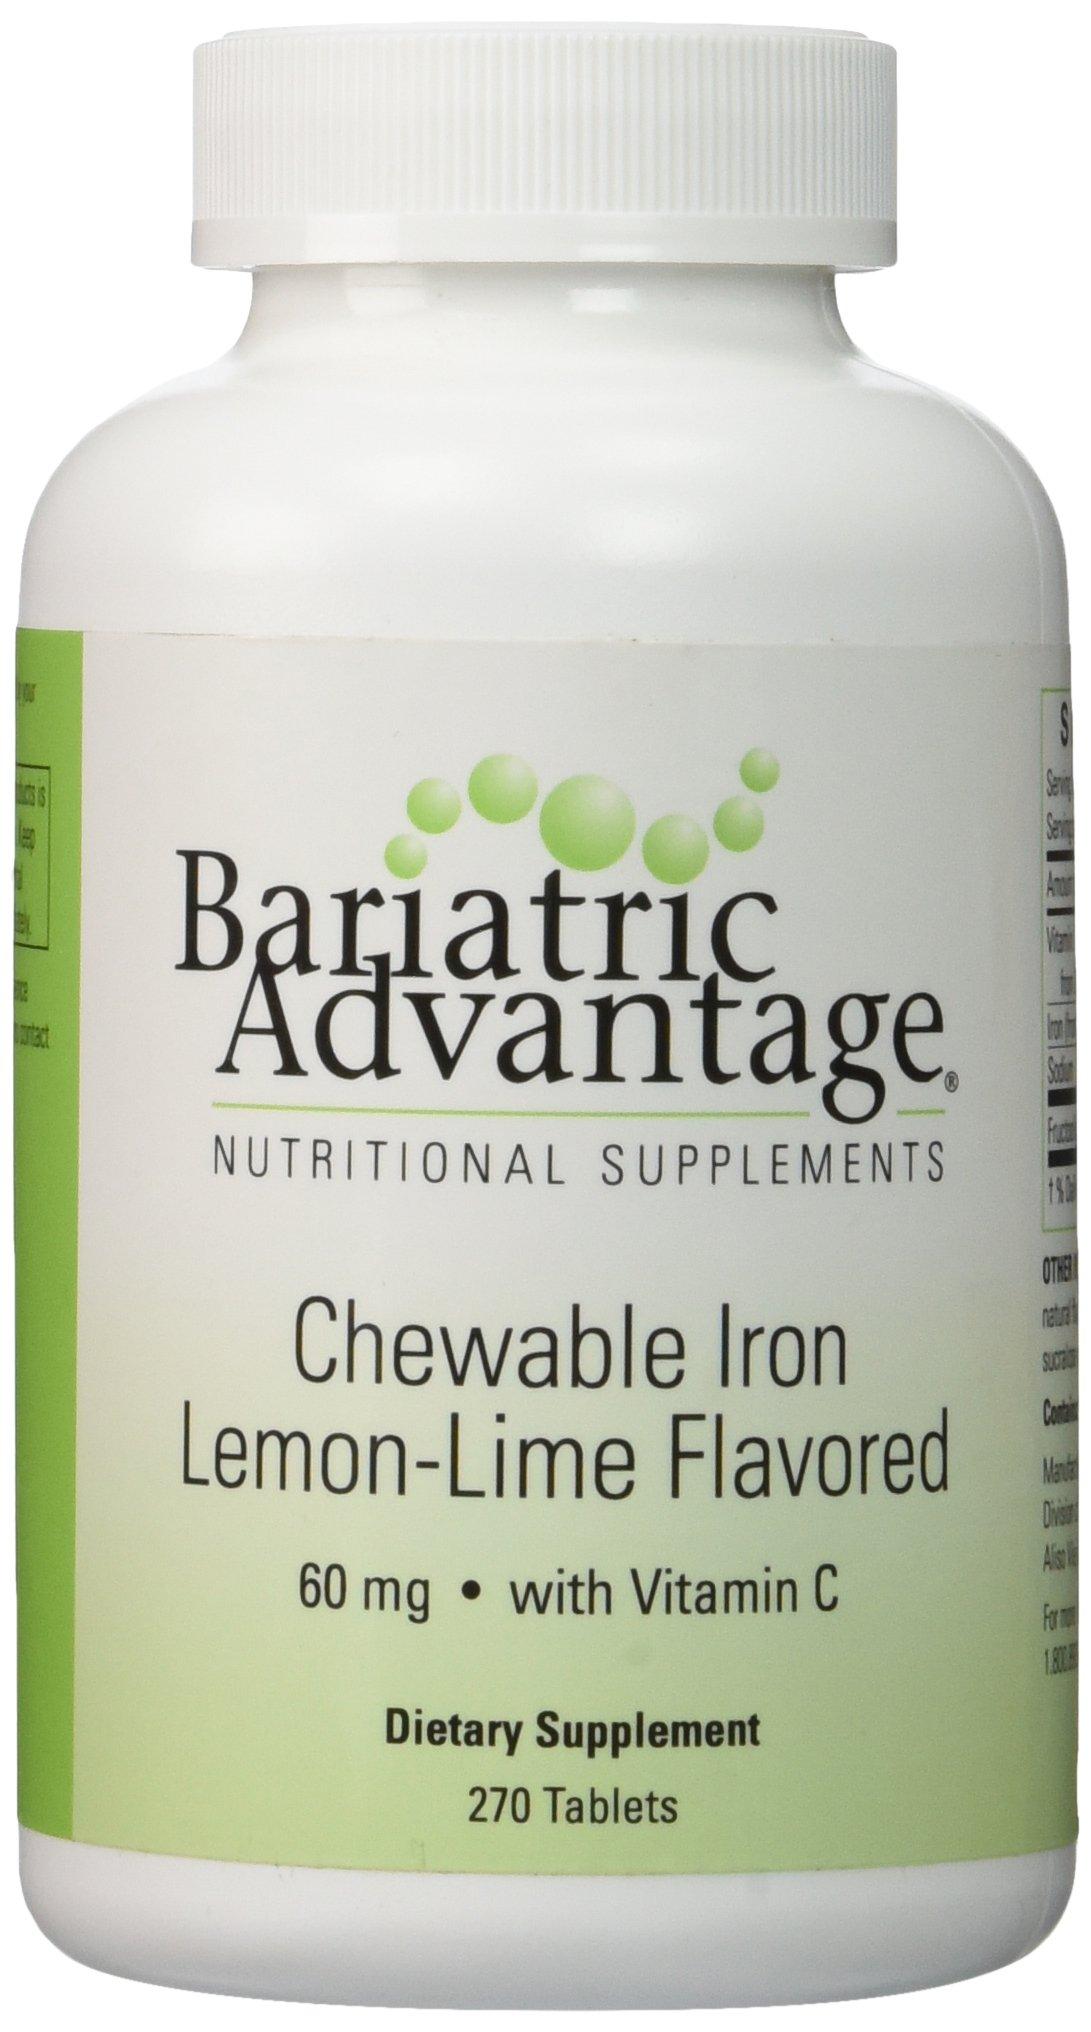 Bariatric Advantage - Chewable Iron 60mg - Lemon Lime, 270 Count